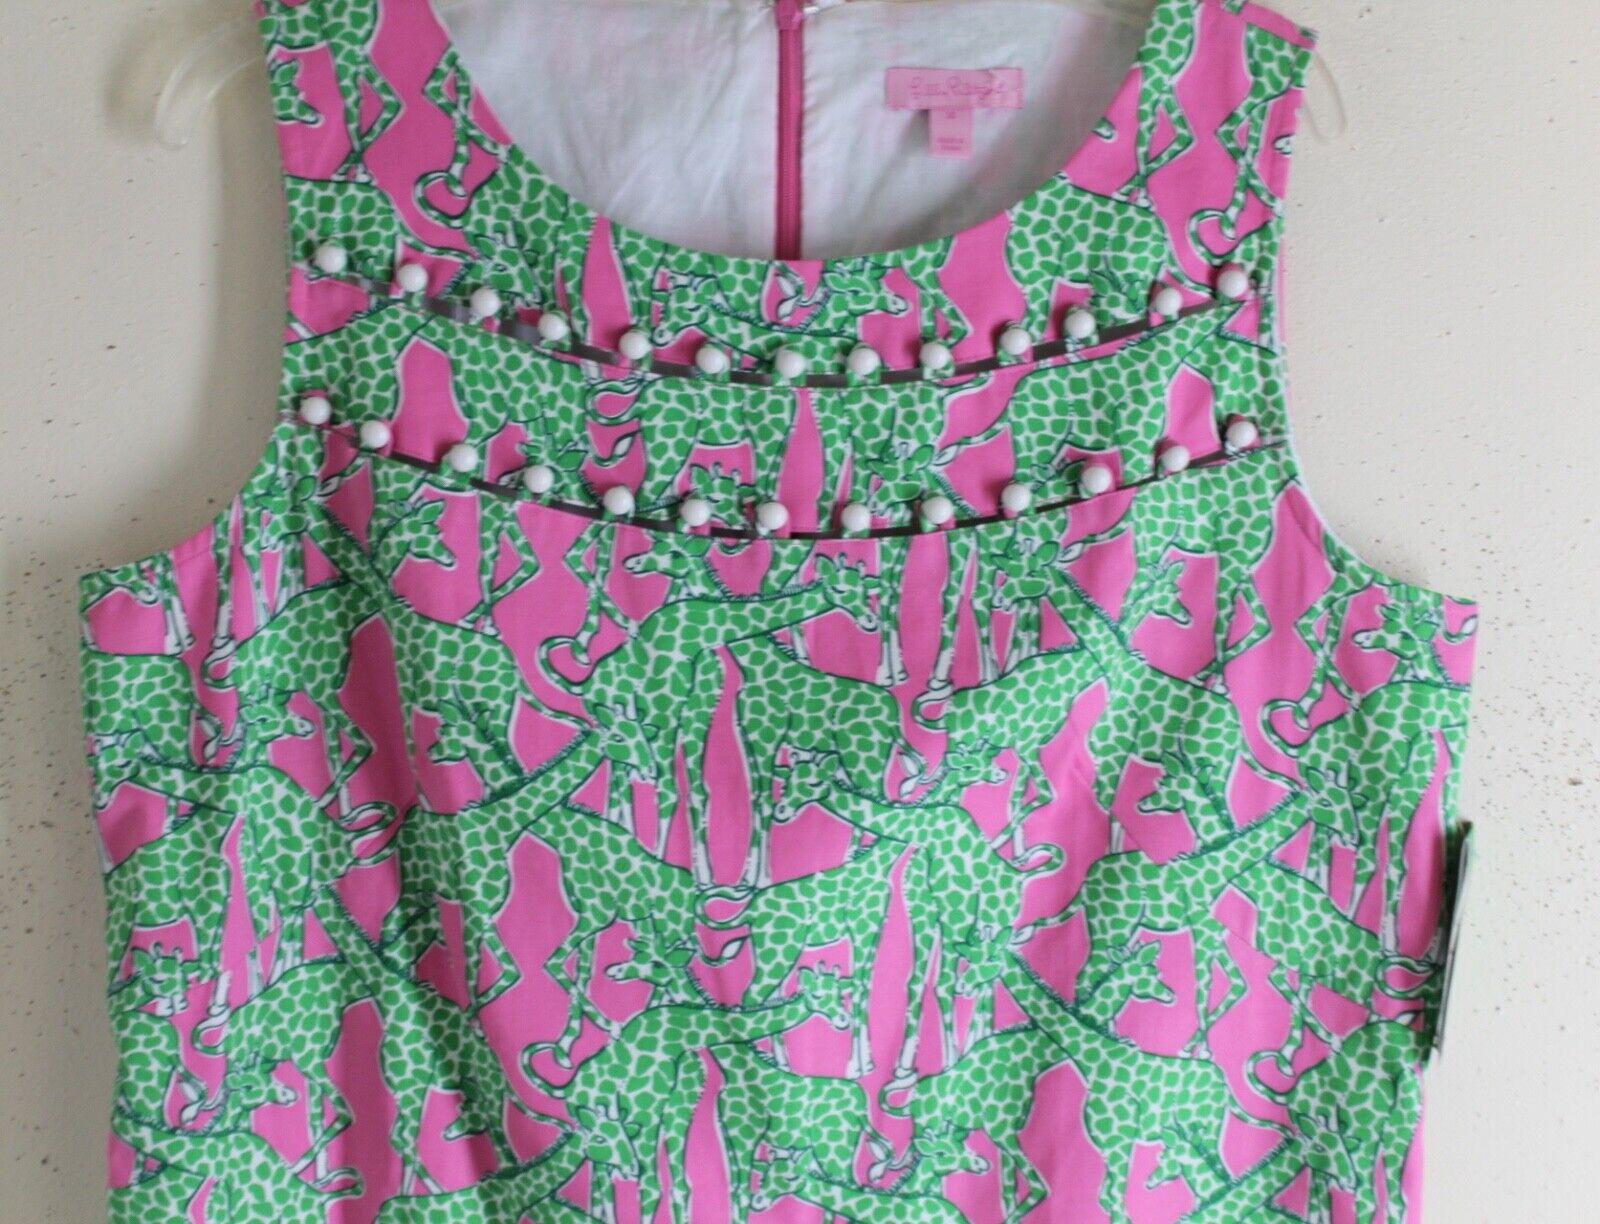 NWT Lilly Pulitzer -Sz 14 Florida Skift Giraff  konst -to -wear Cotton Dress